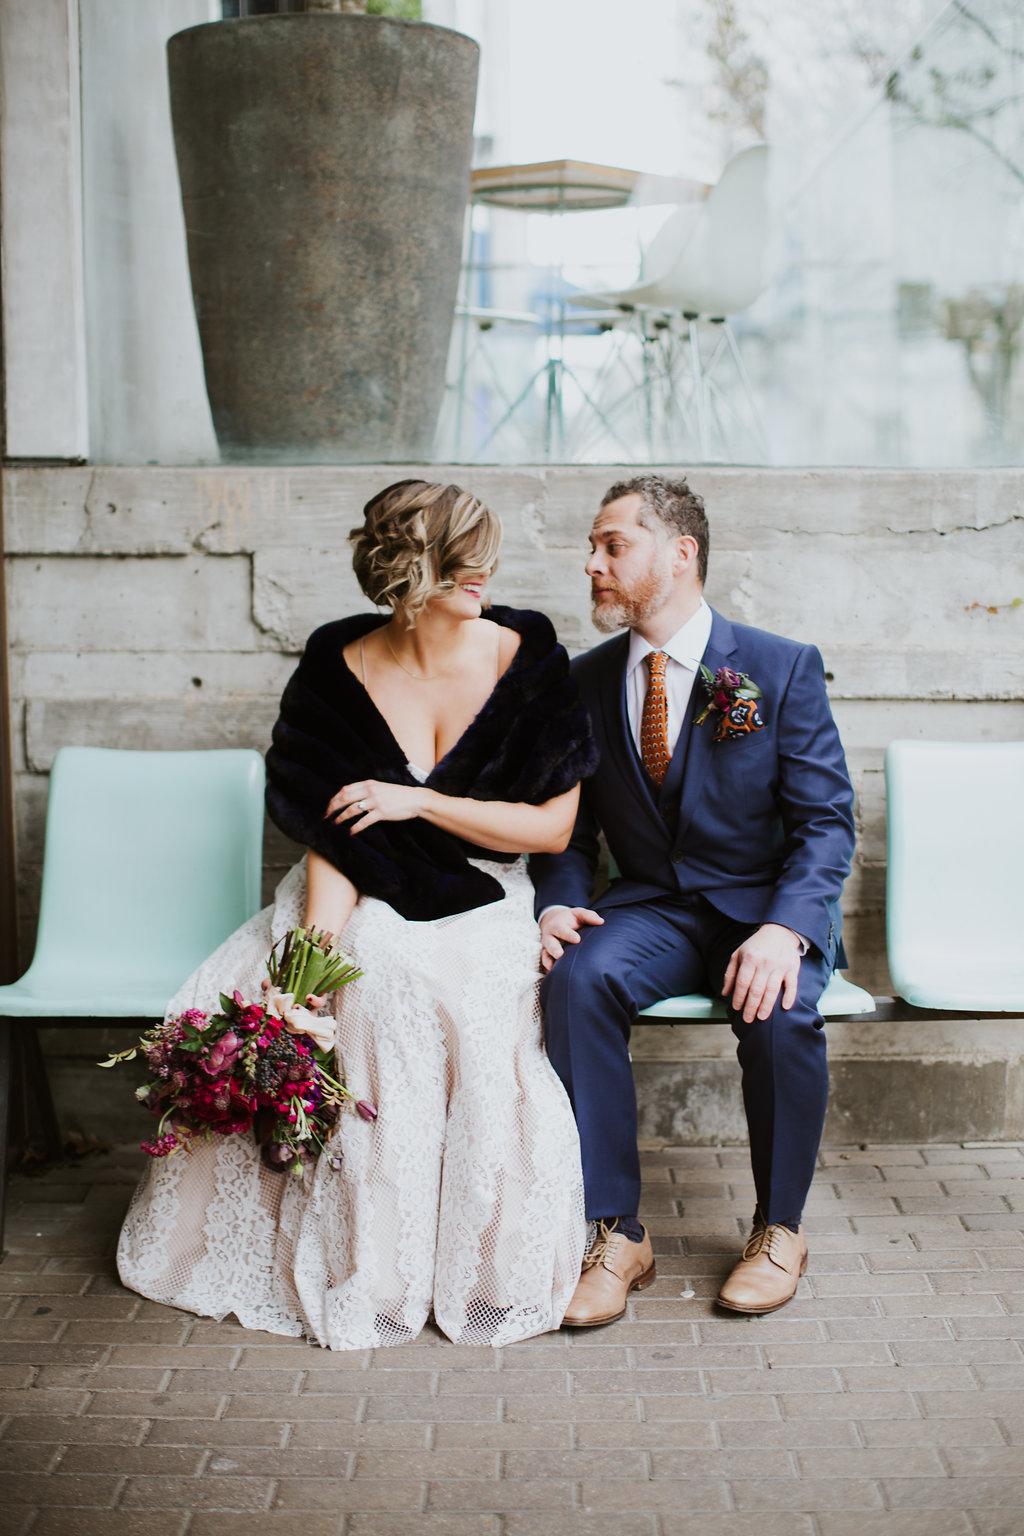 Paige-Newton-Intimate-Wedding-Photographer-Malverde-Wedding-Photography0027.jpg